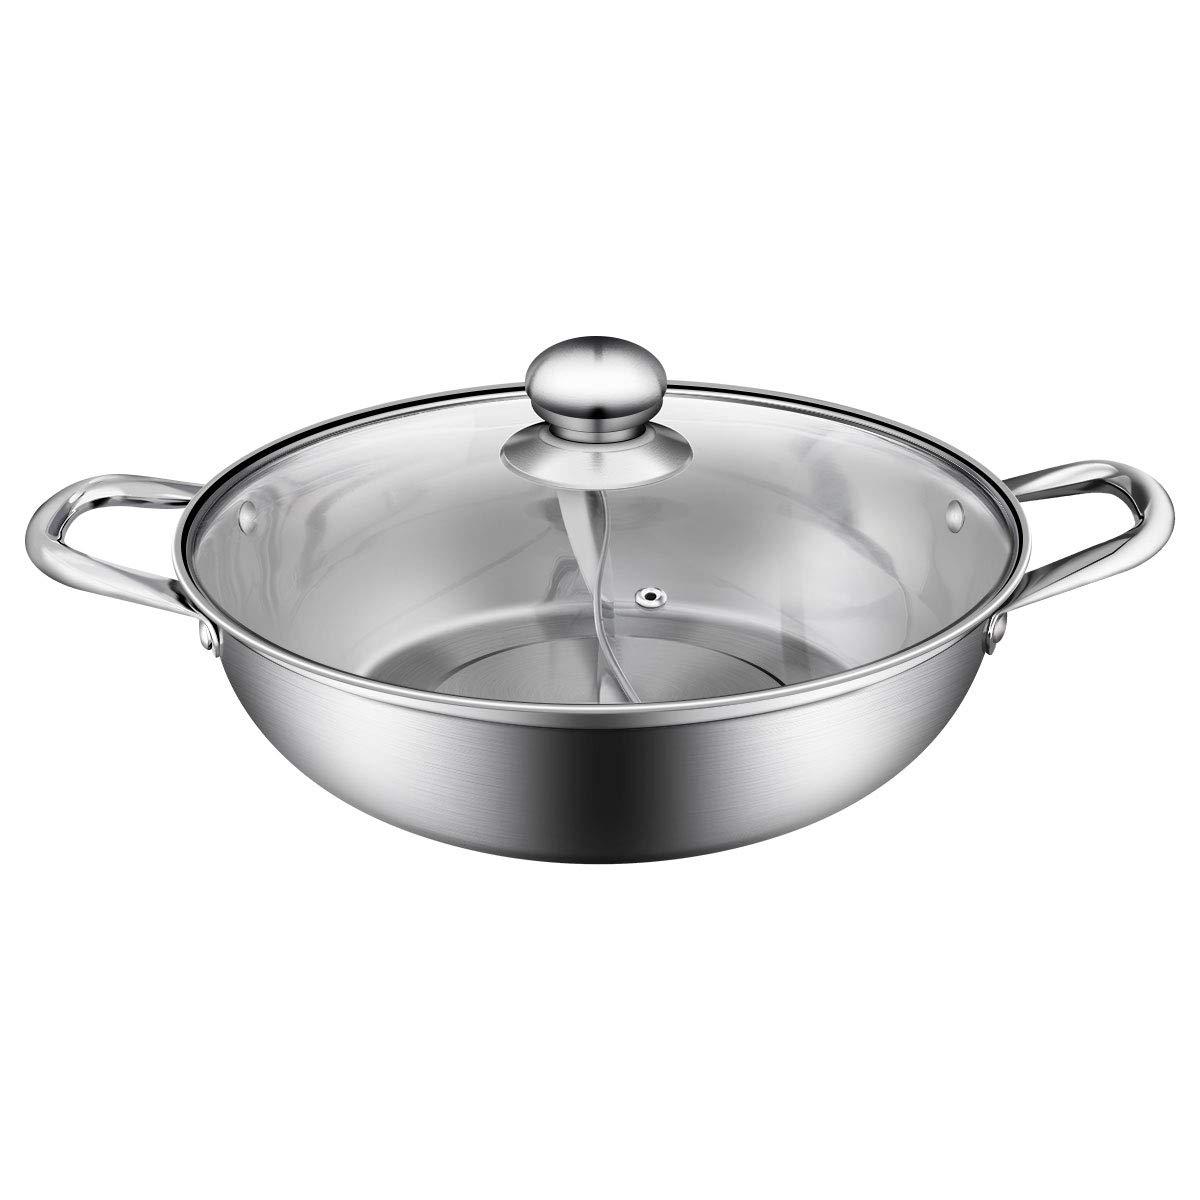 BESTONZON 1pc Multifunctional 304 Stainless Steel Shabu-shabu/Hot Pot With Glass Lid,Non-stick Cooking Pots(30cm)